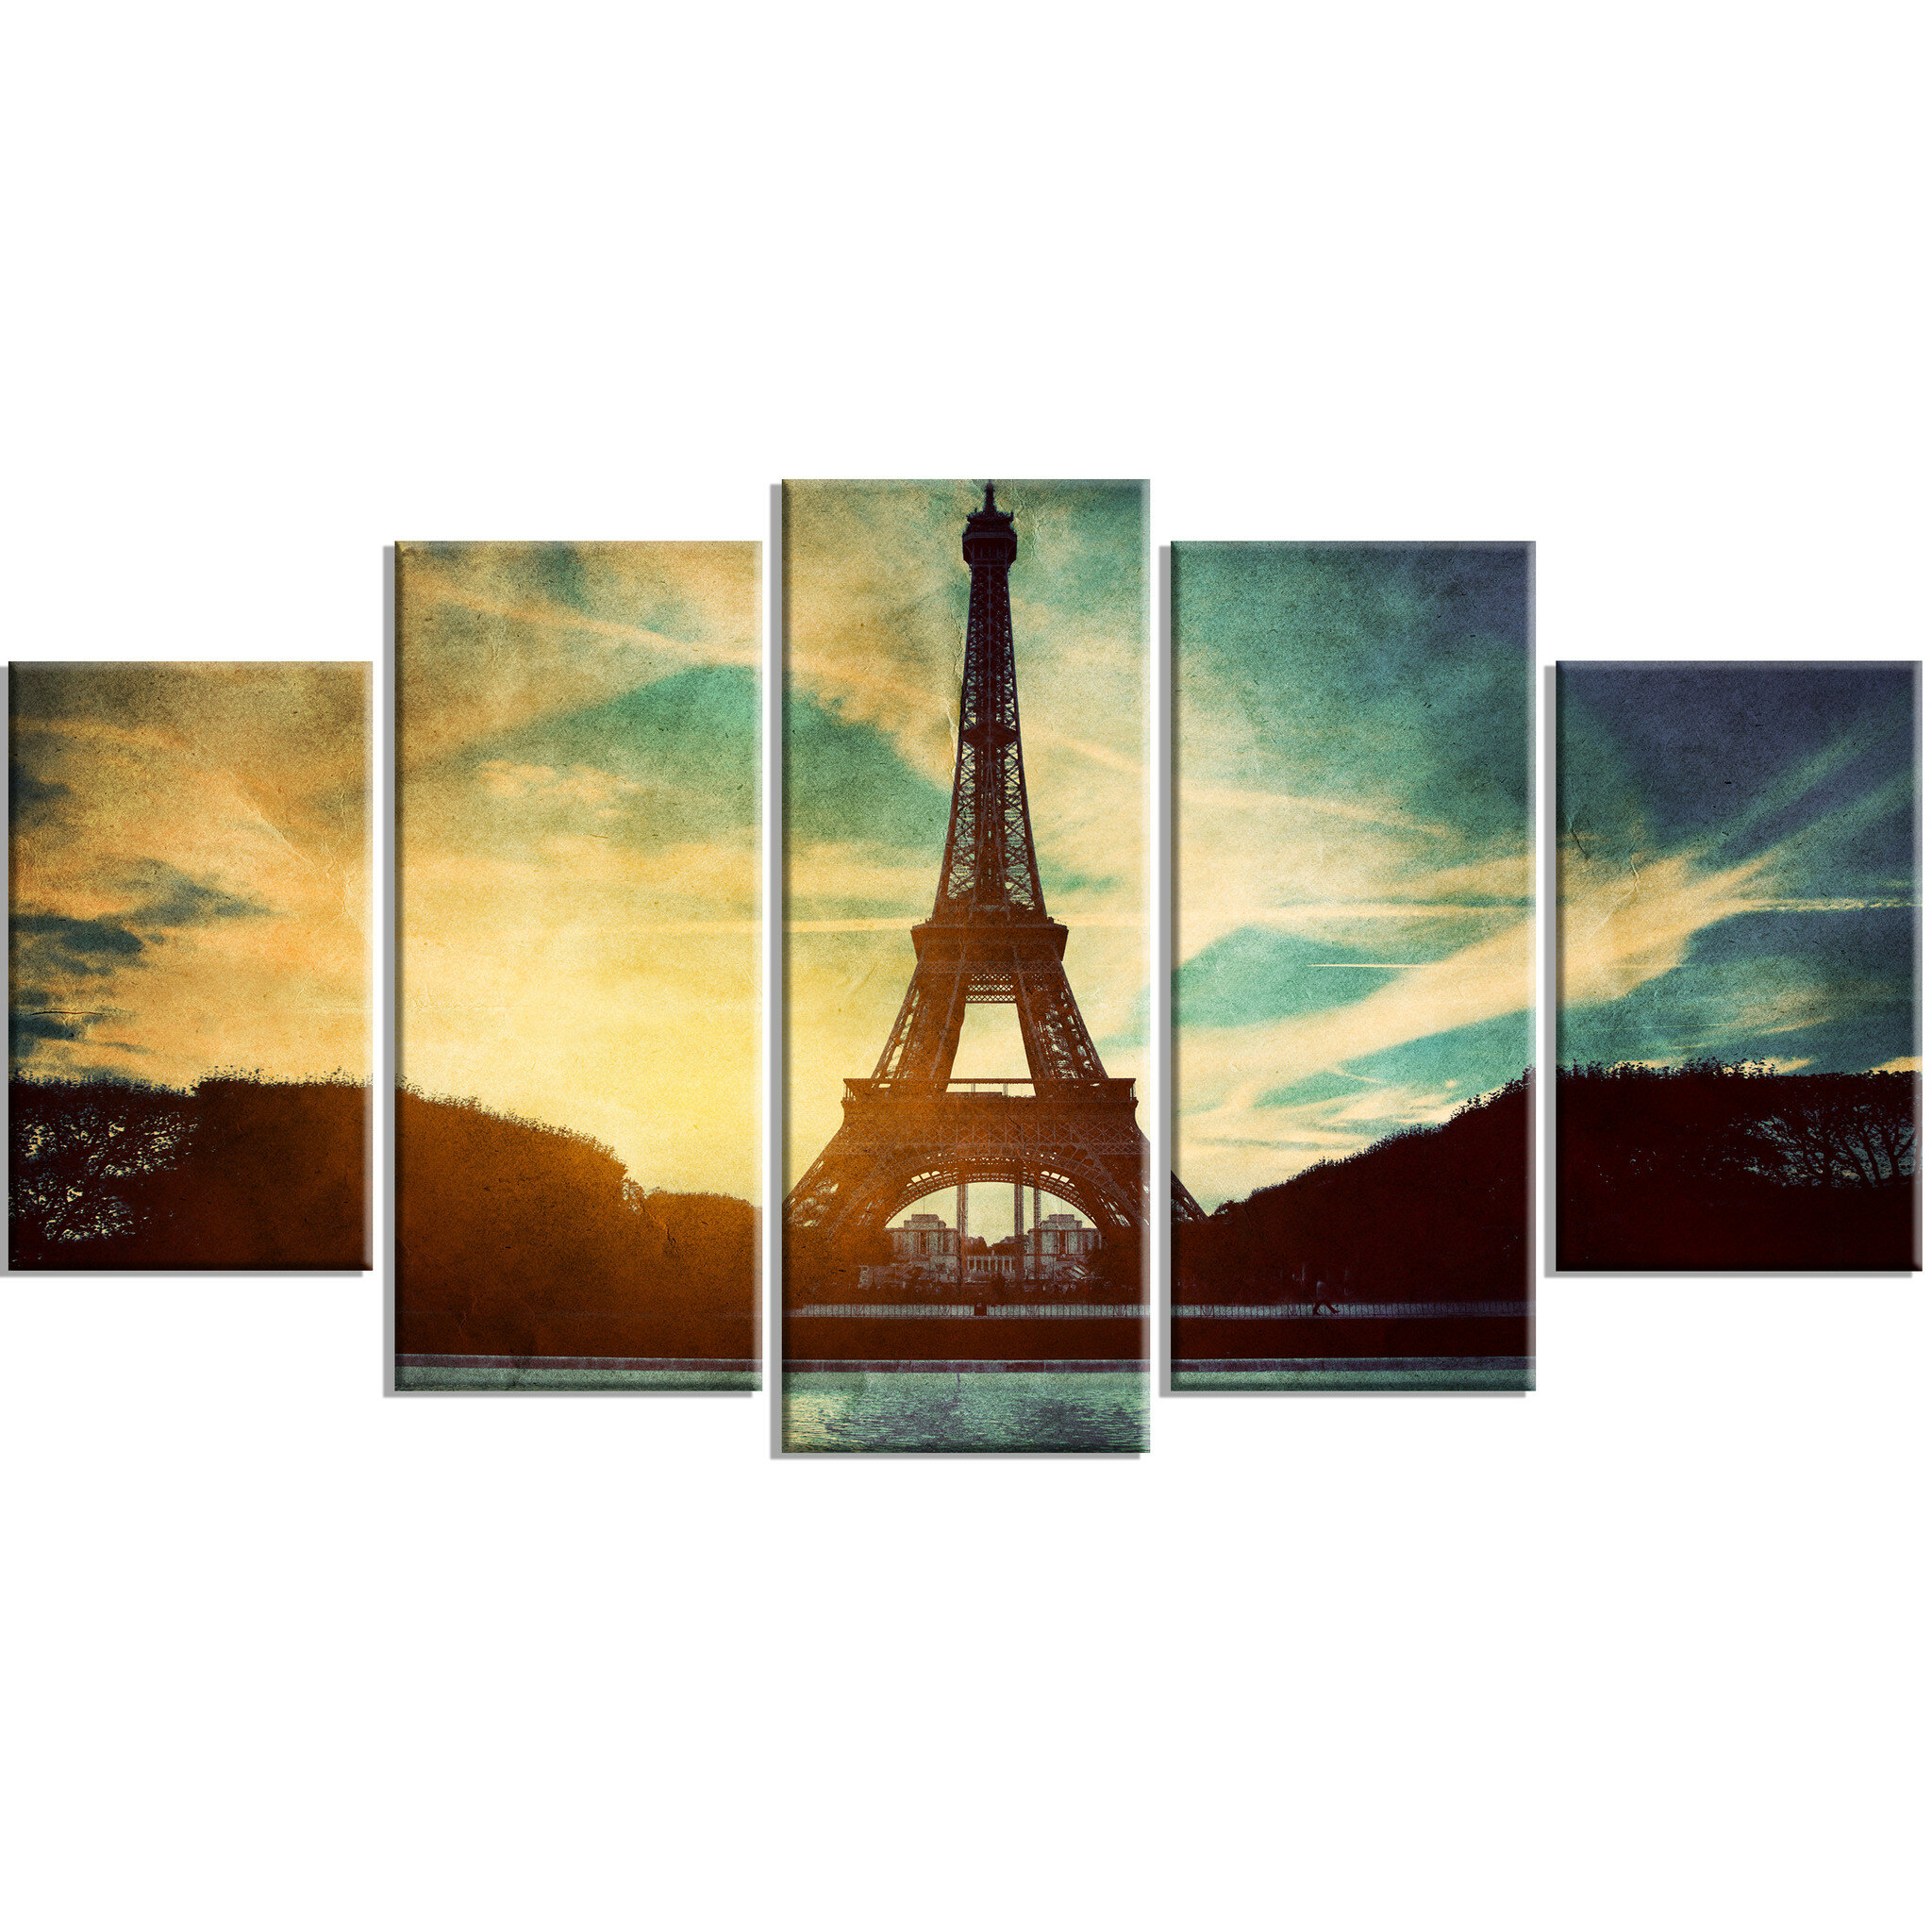 DesignArt Metal \'Eiffel Tower Retro Style\' 5 Piece Photographic ...